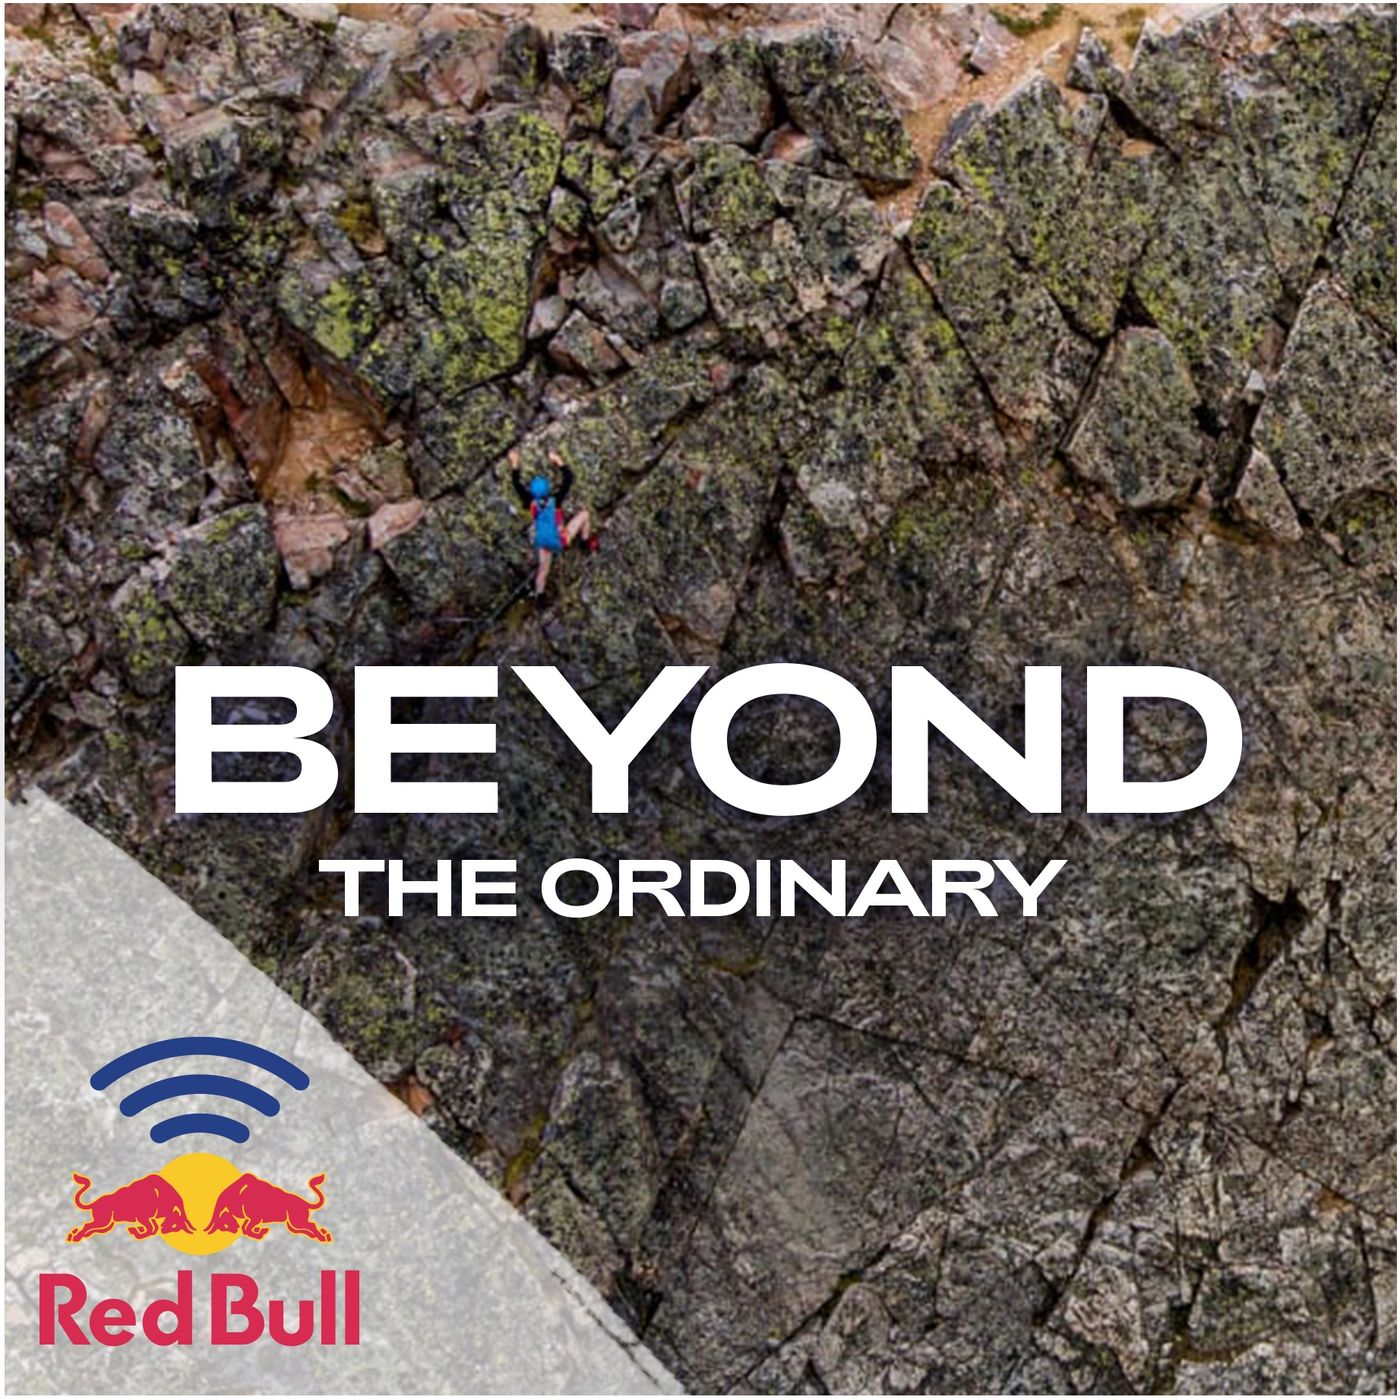 How do you create an intense mountain triathlon in your own backyard?